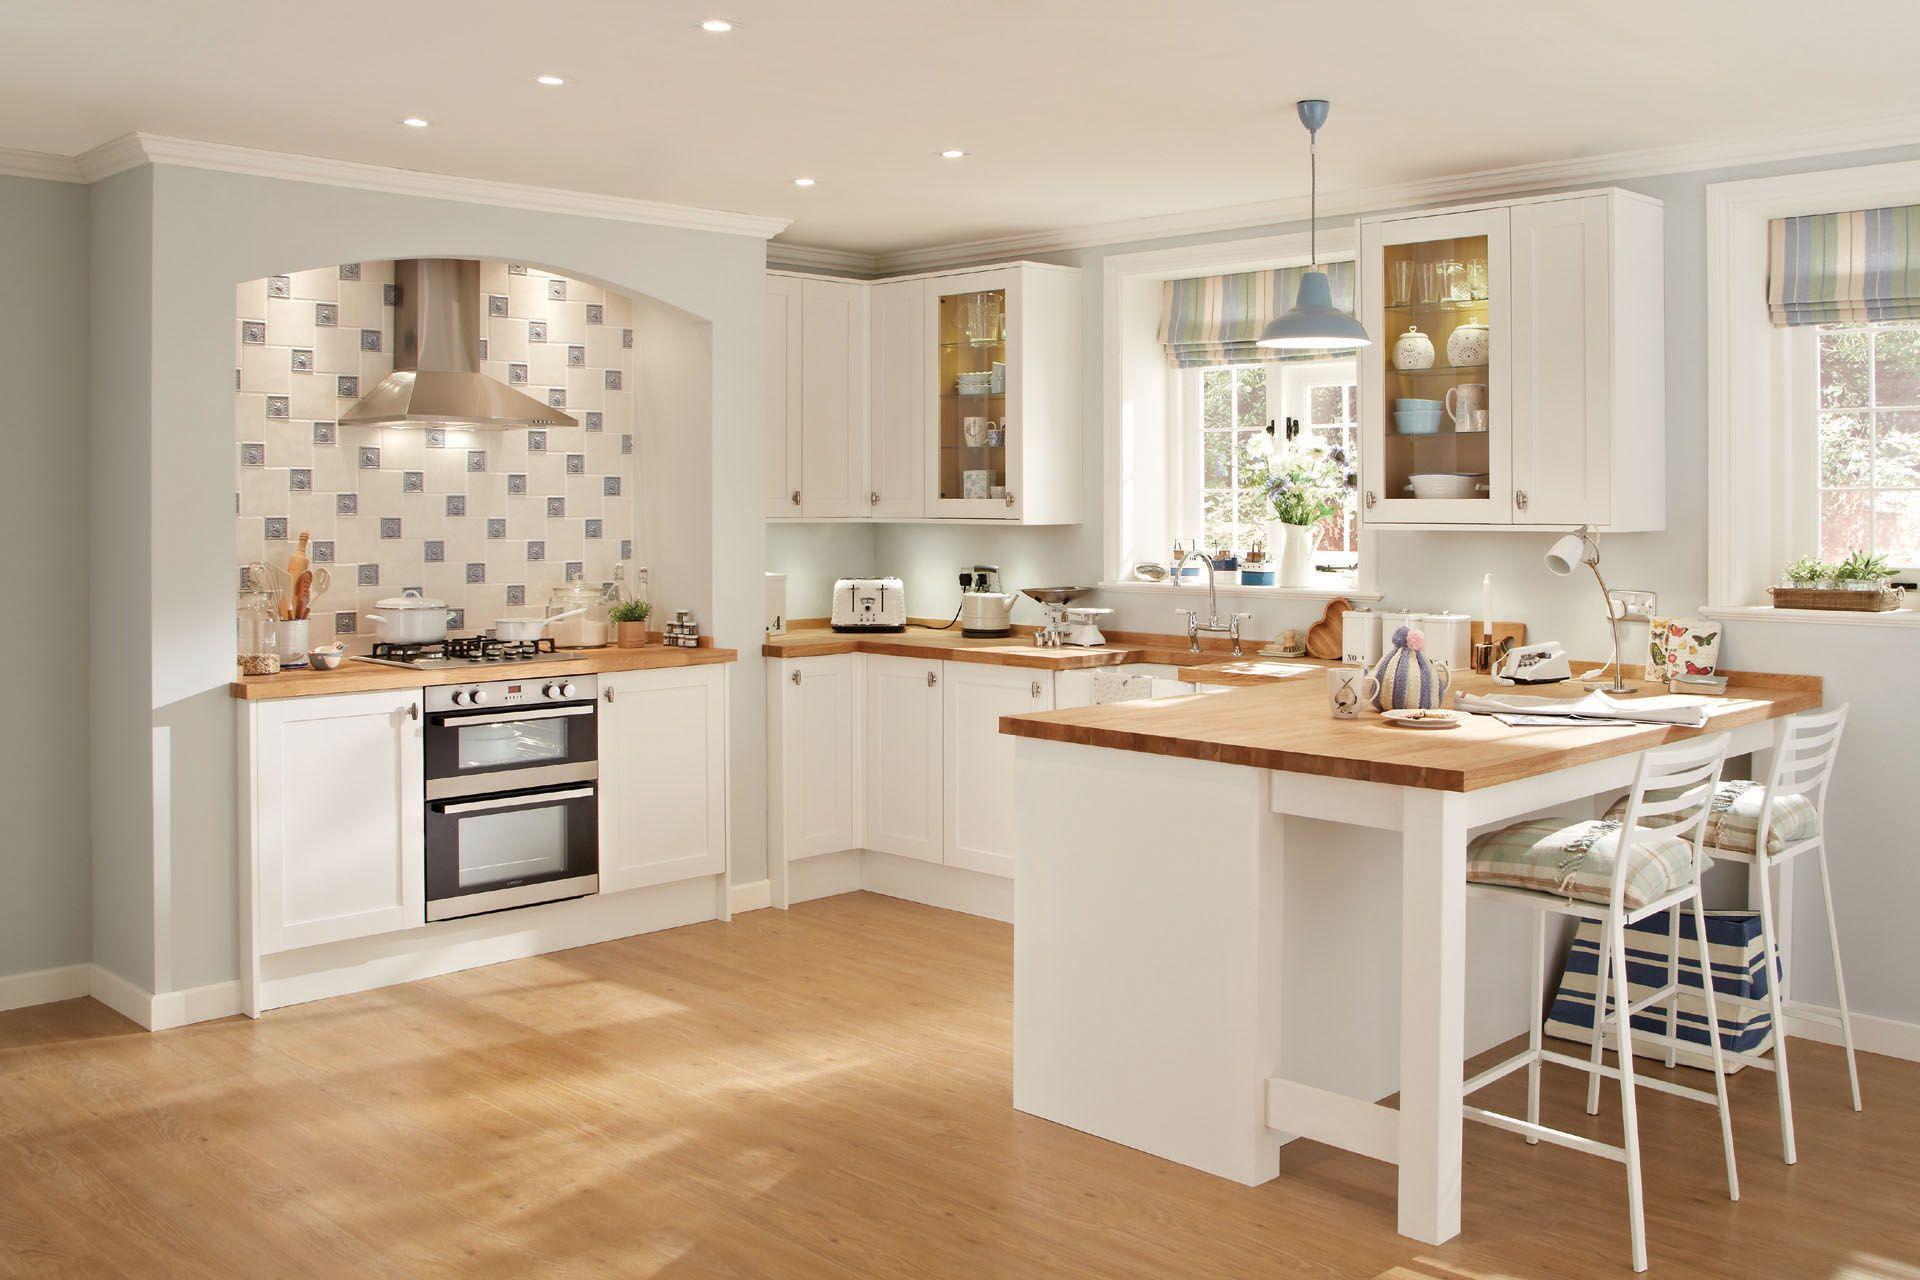 Imagem relacionada | интерьер | Pinterest | Kitchens, House and ...